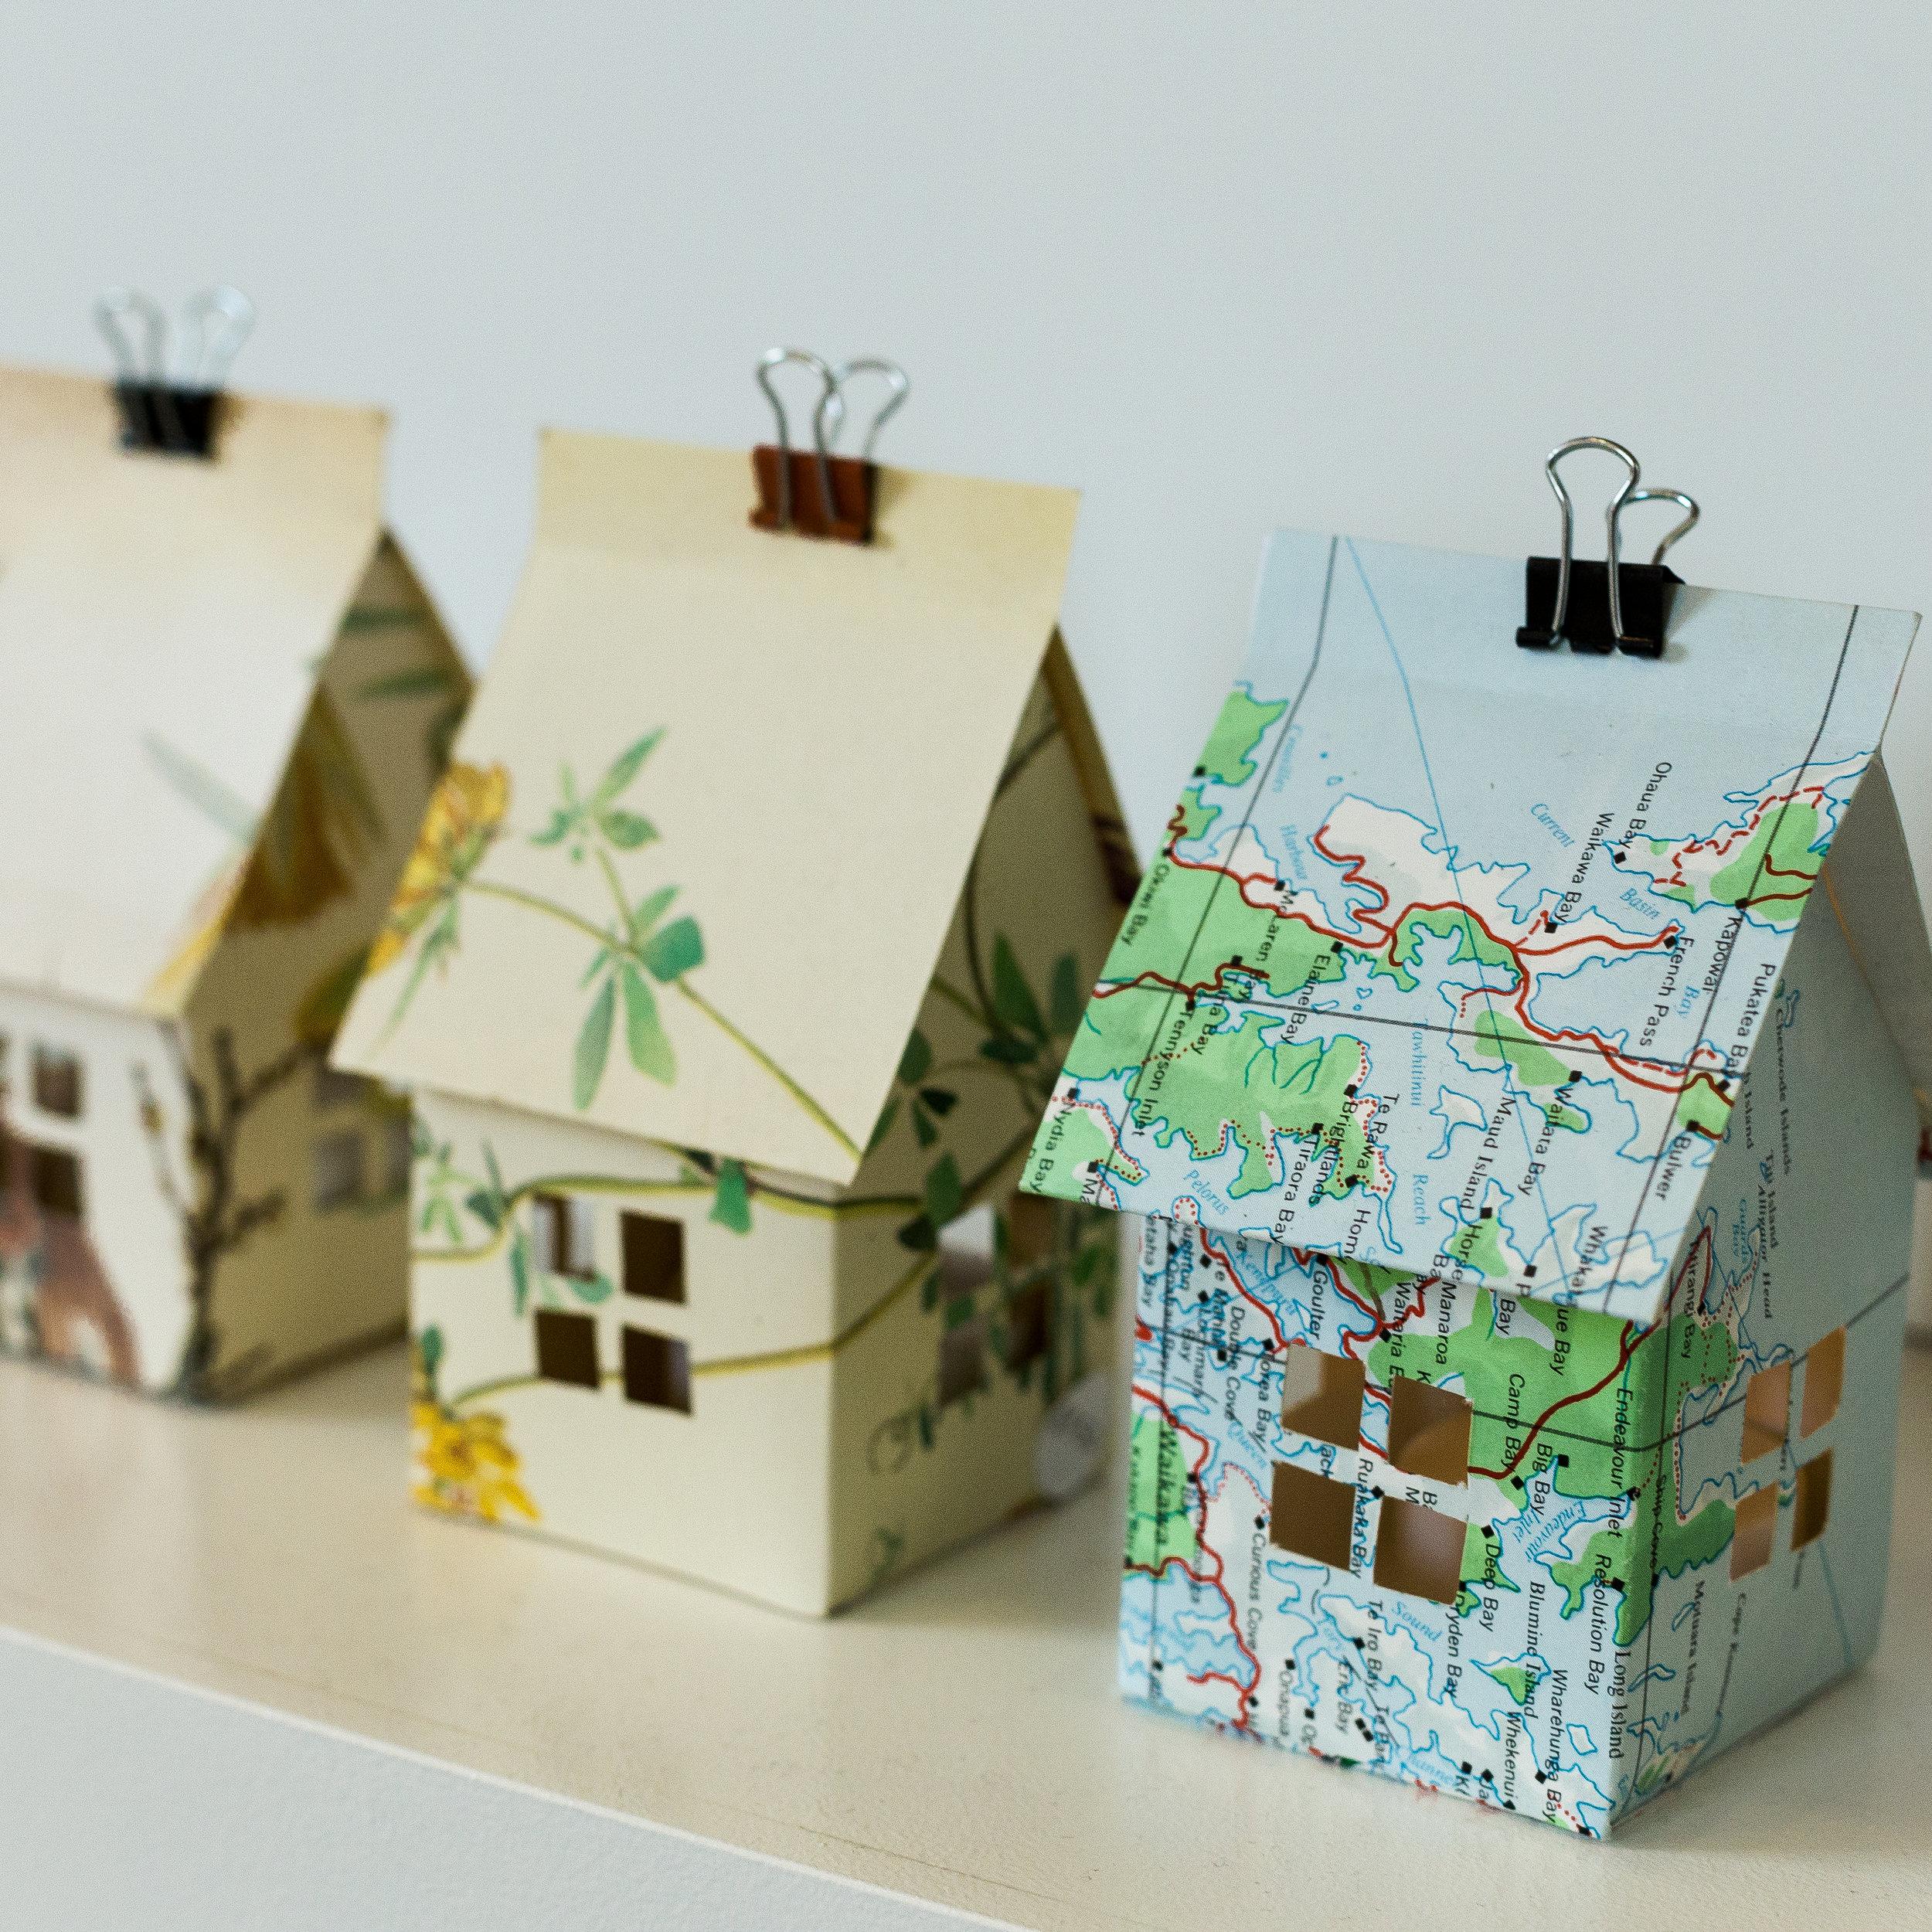 Mini Paper Houses by Marama Davis